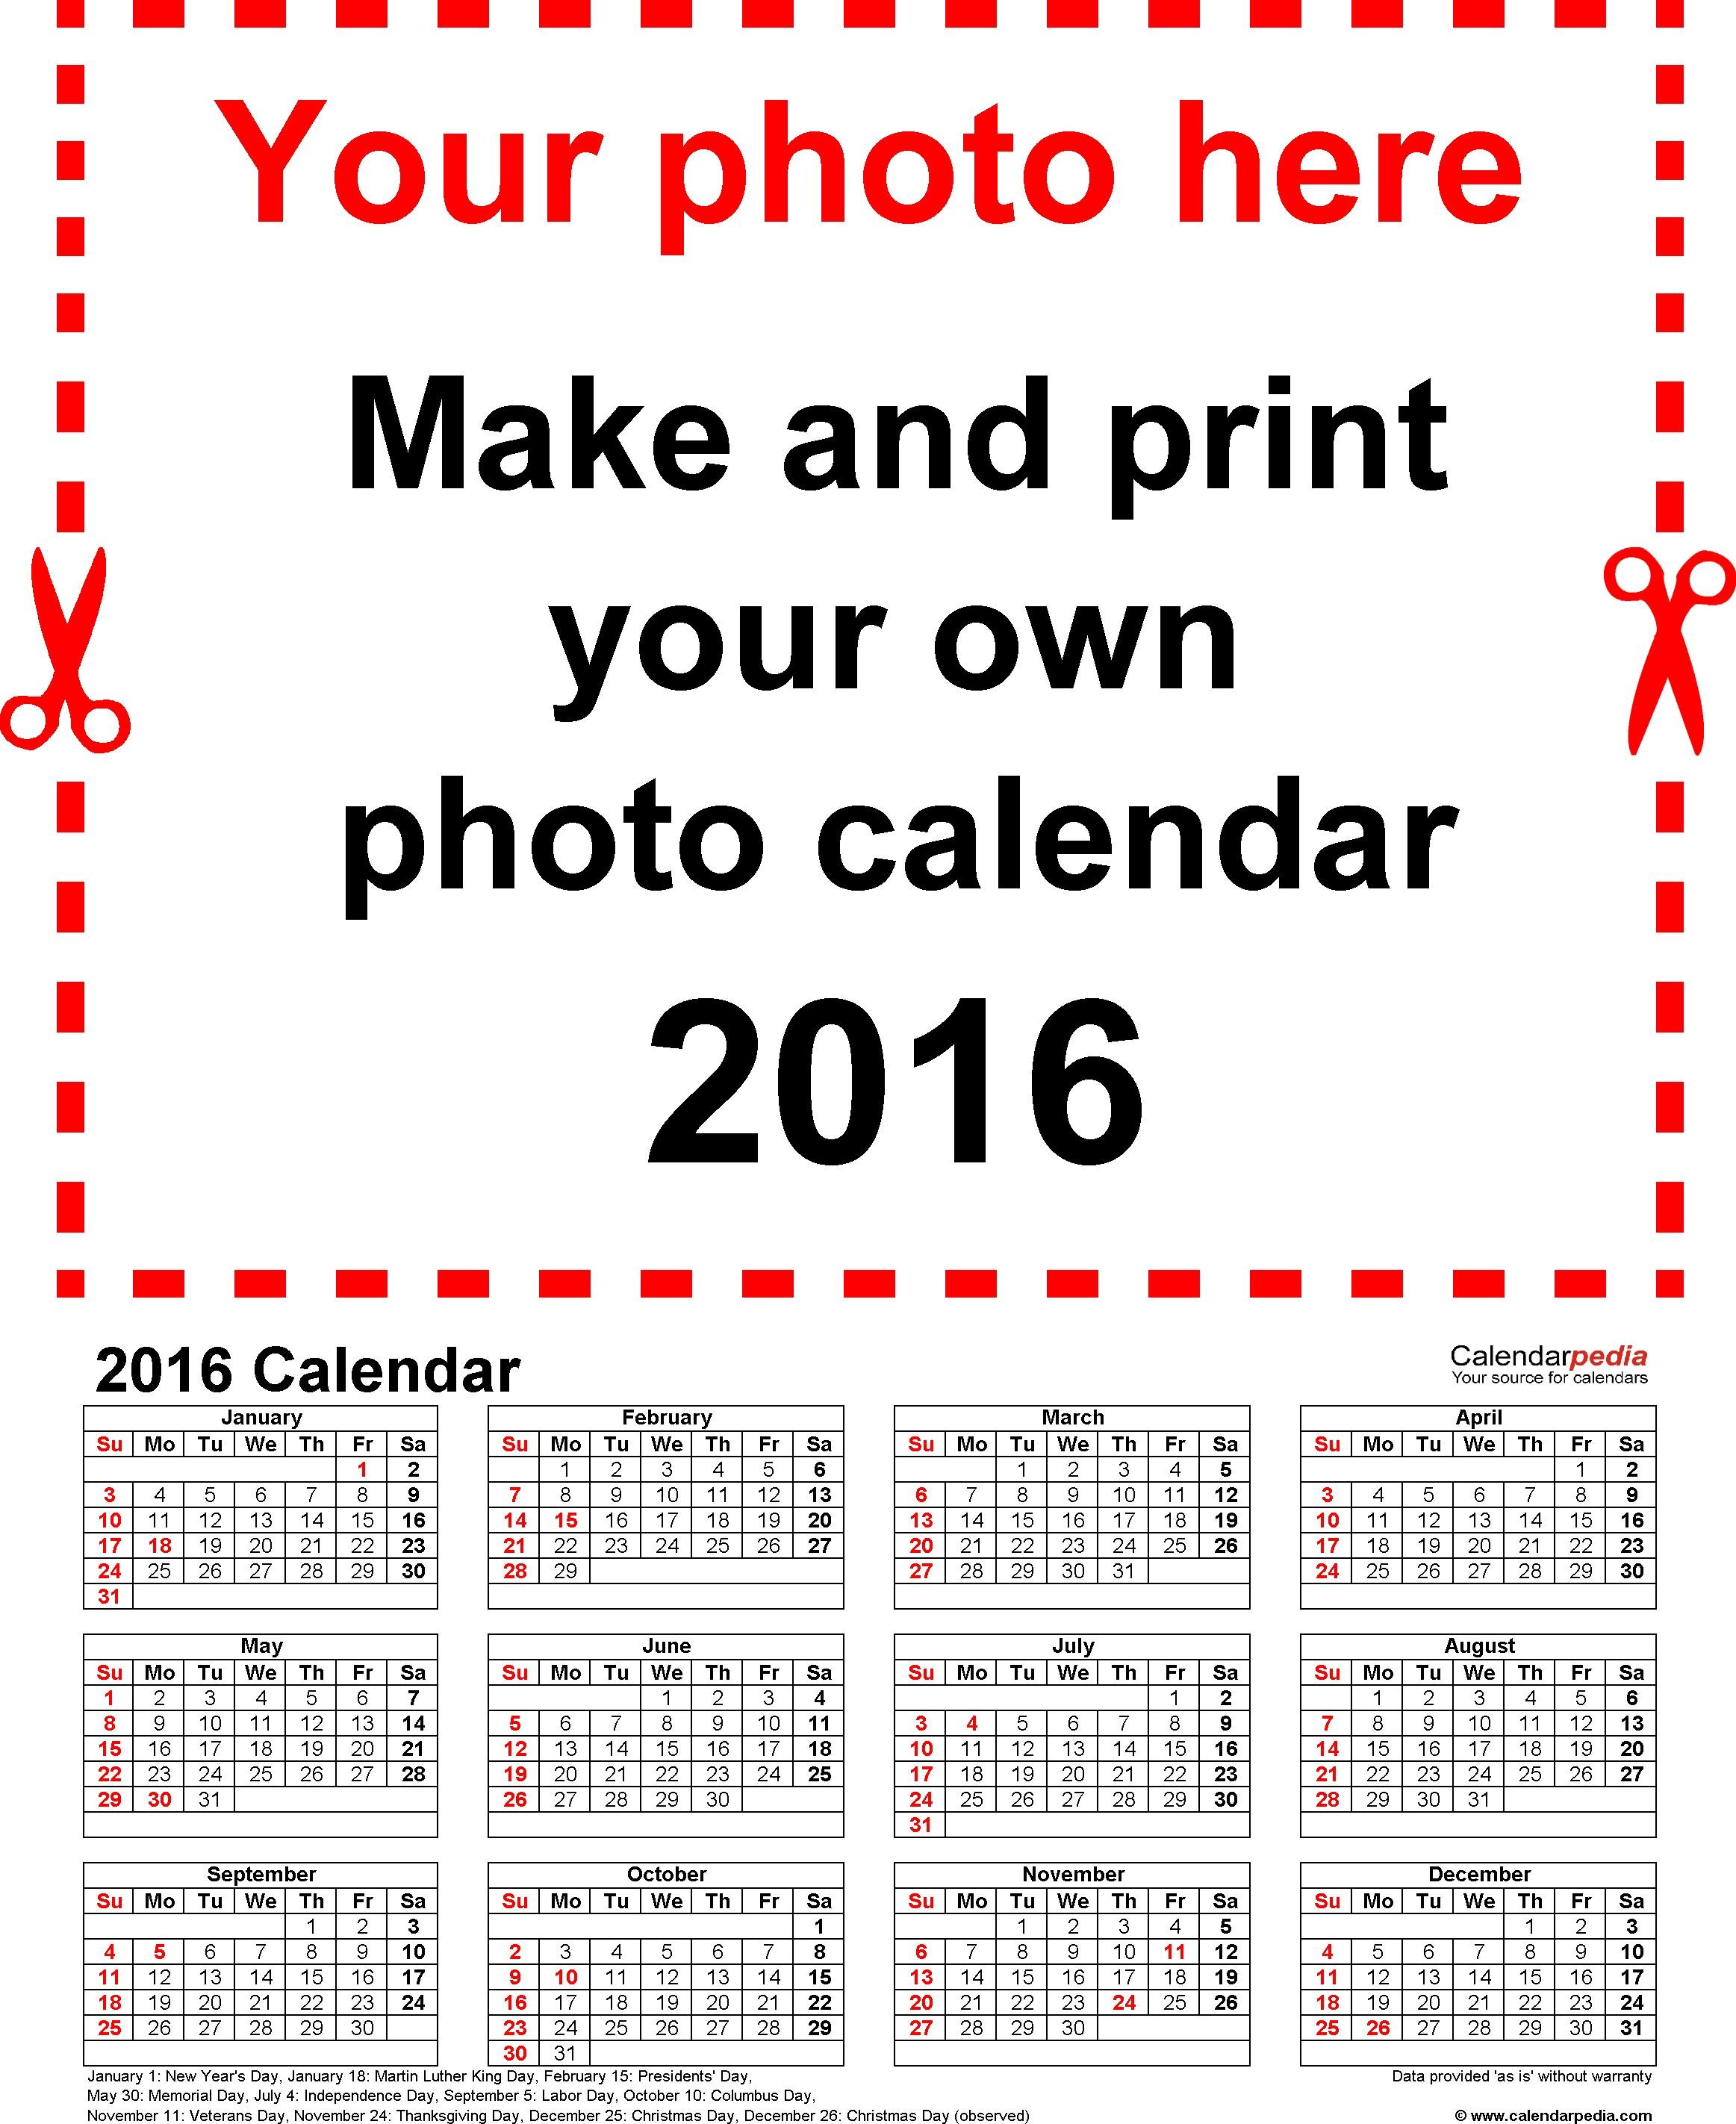 2019 Calendar Philippines Excel Más Recientes Best Create Calendar Template Year Calendar Template Of 2019 Calendar Philippines Excel Recientes 94 March April 2018 Calendar with Holidays Blank Calendar March